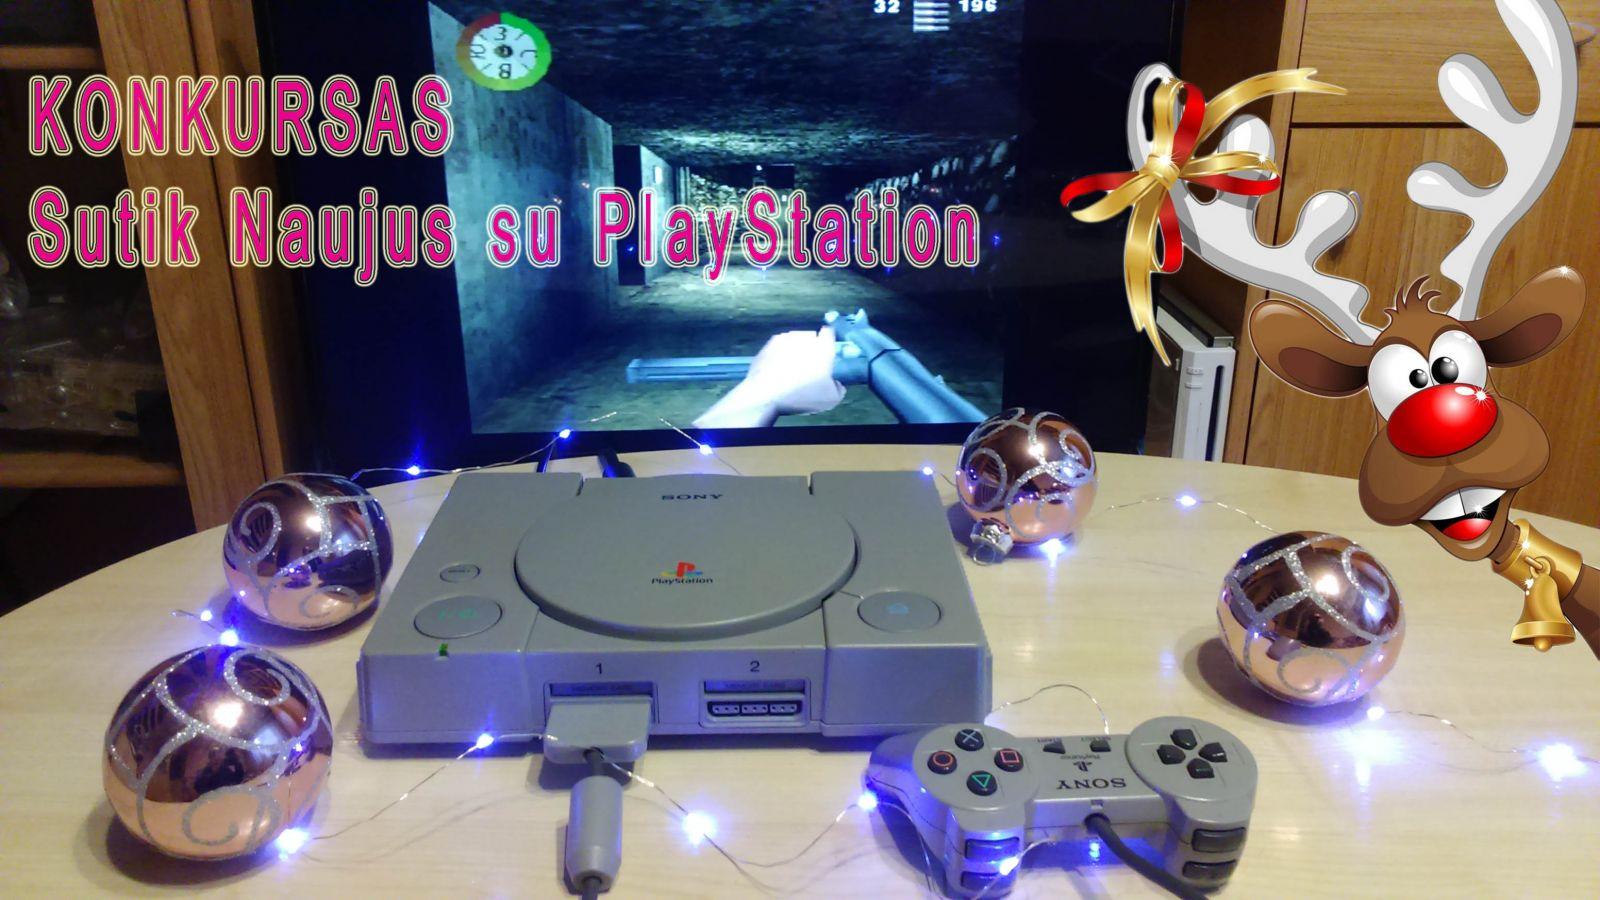 KONKURSAS: Naujieji su PlayStation